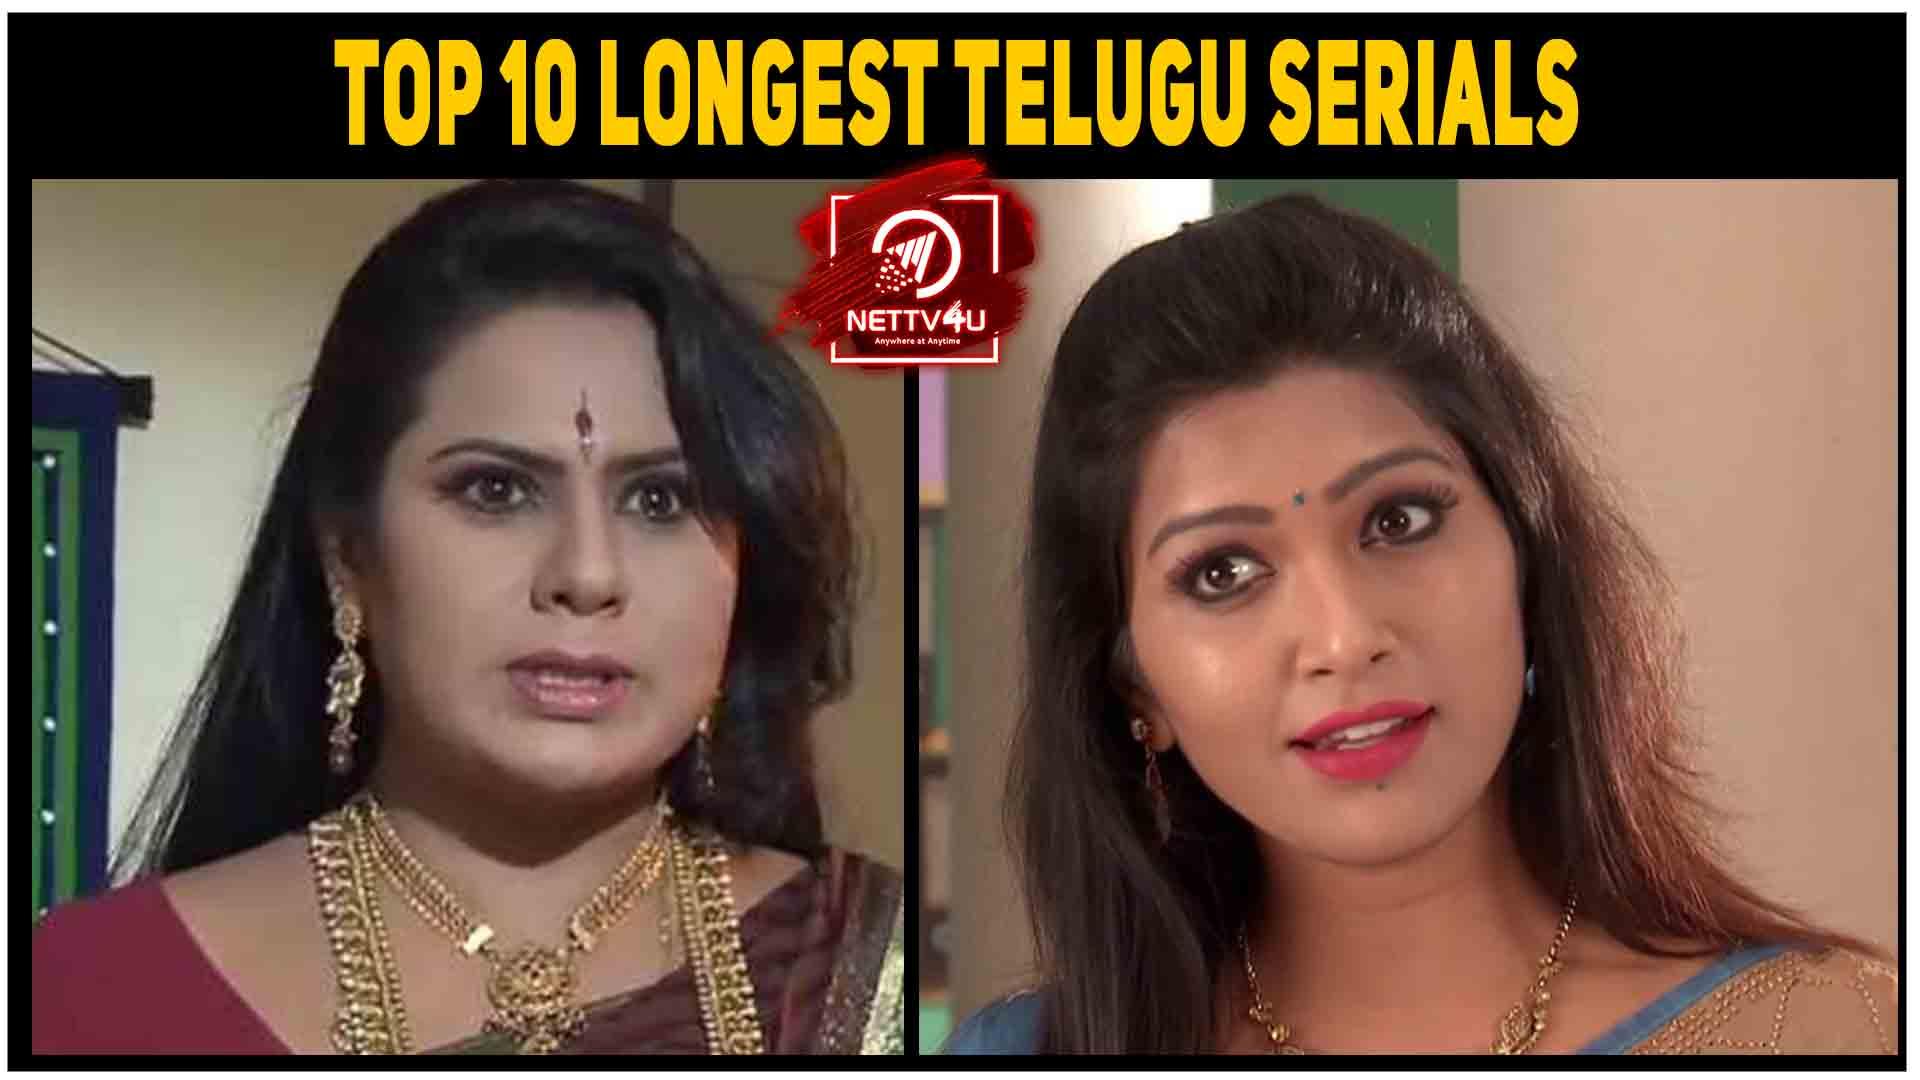 Top 10 Longest Telugu Serials | Latest Articles | NETTV4U